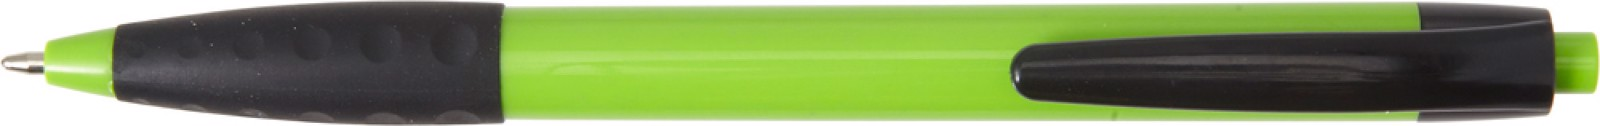 ABS ballpen - Lime